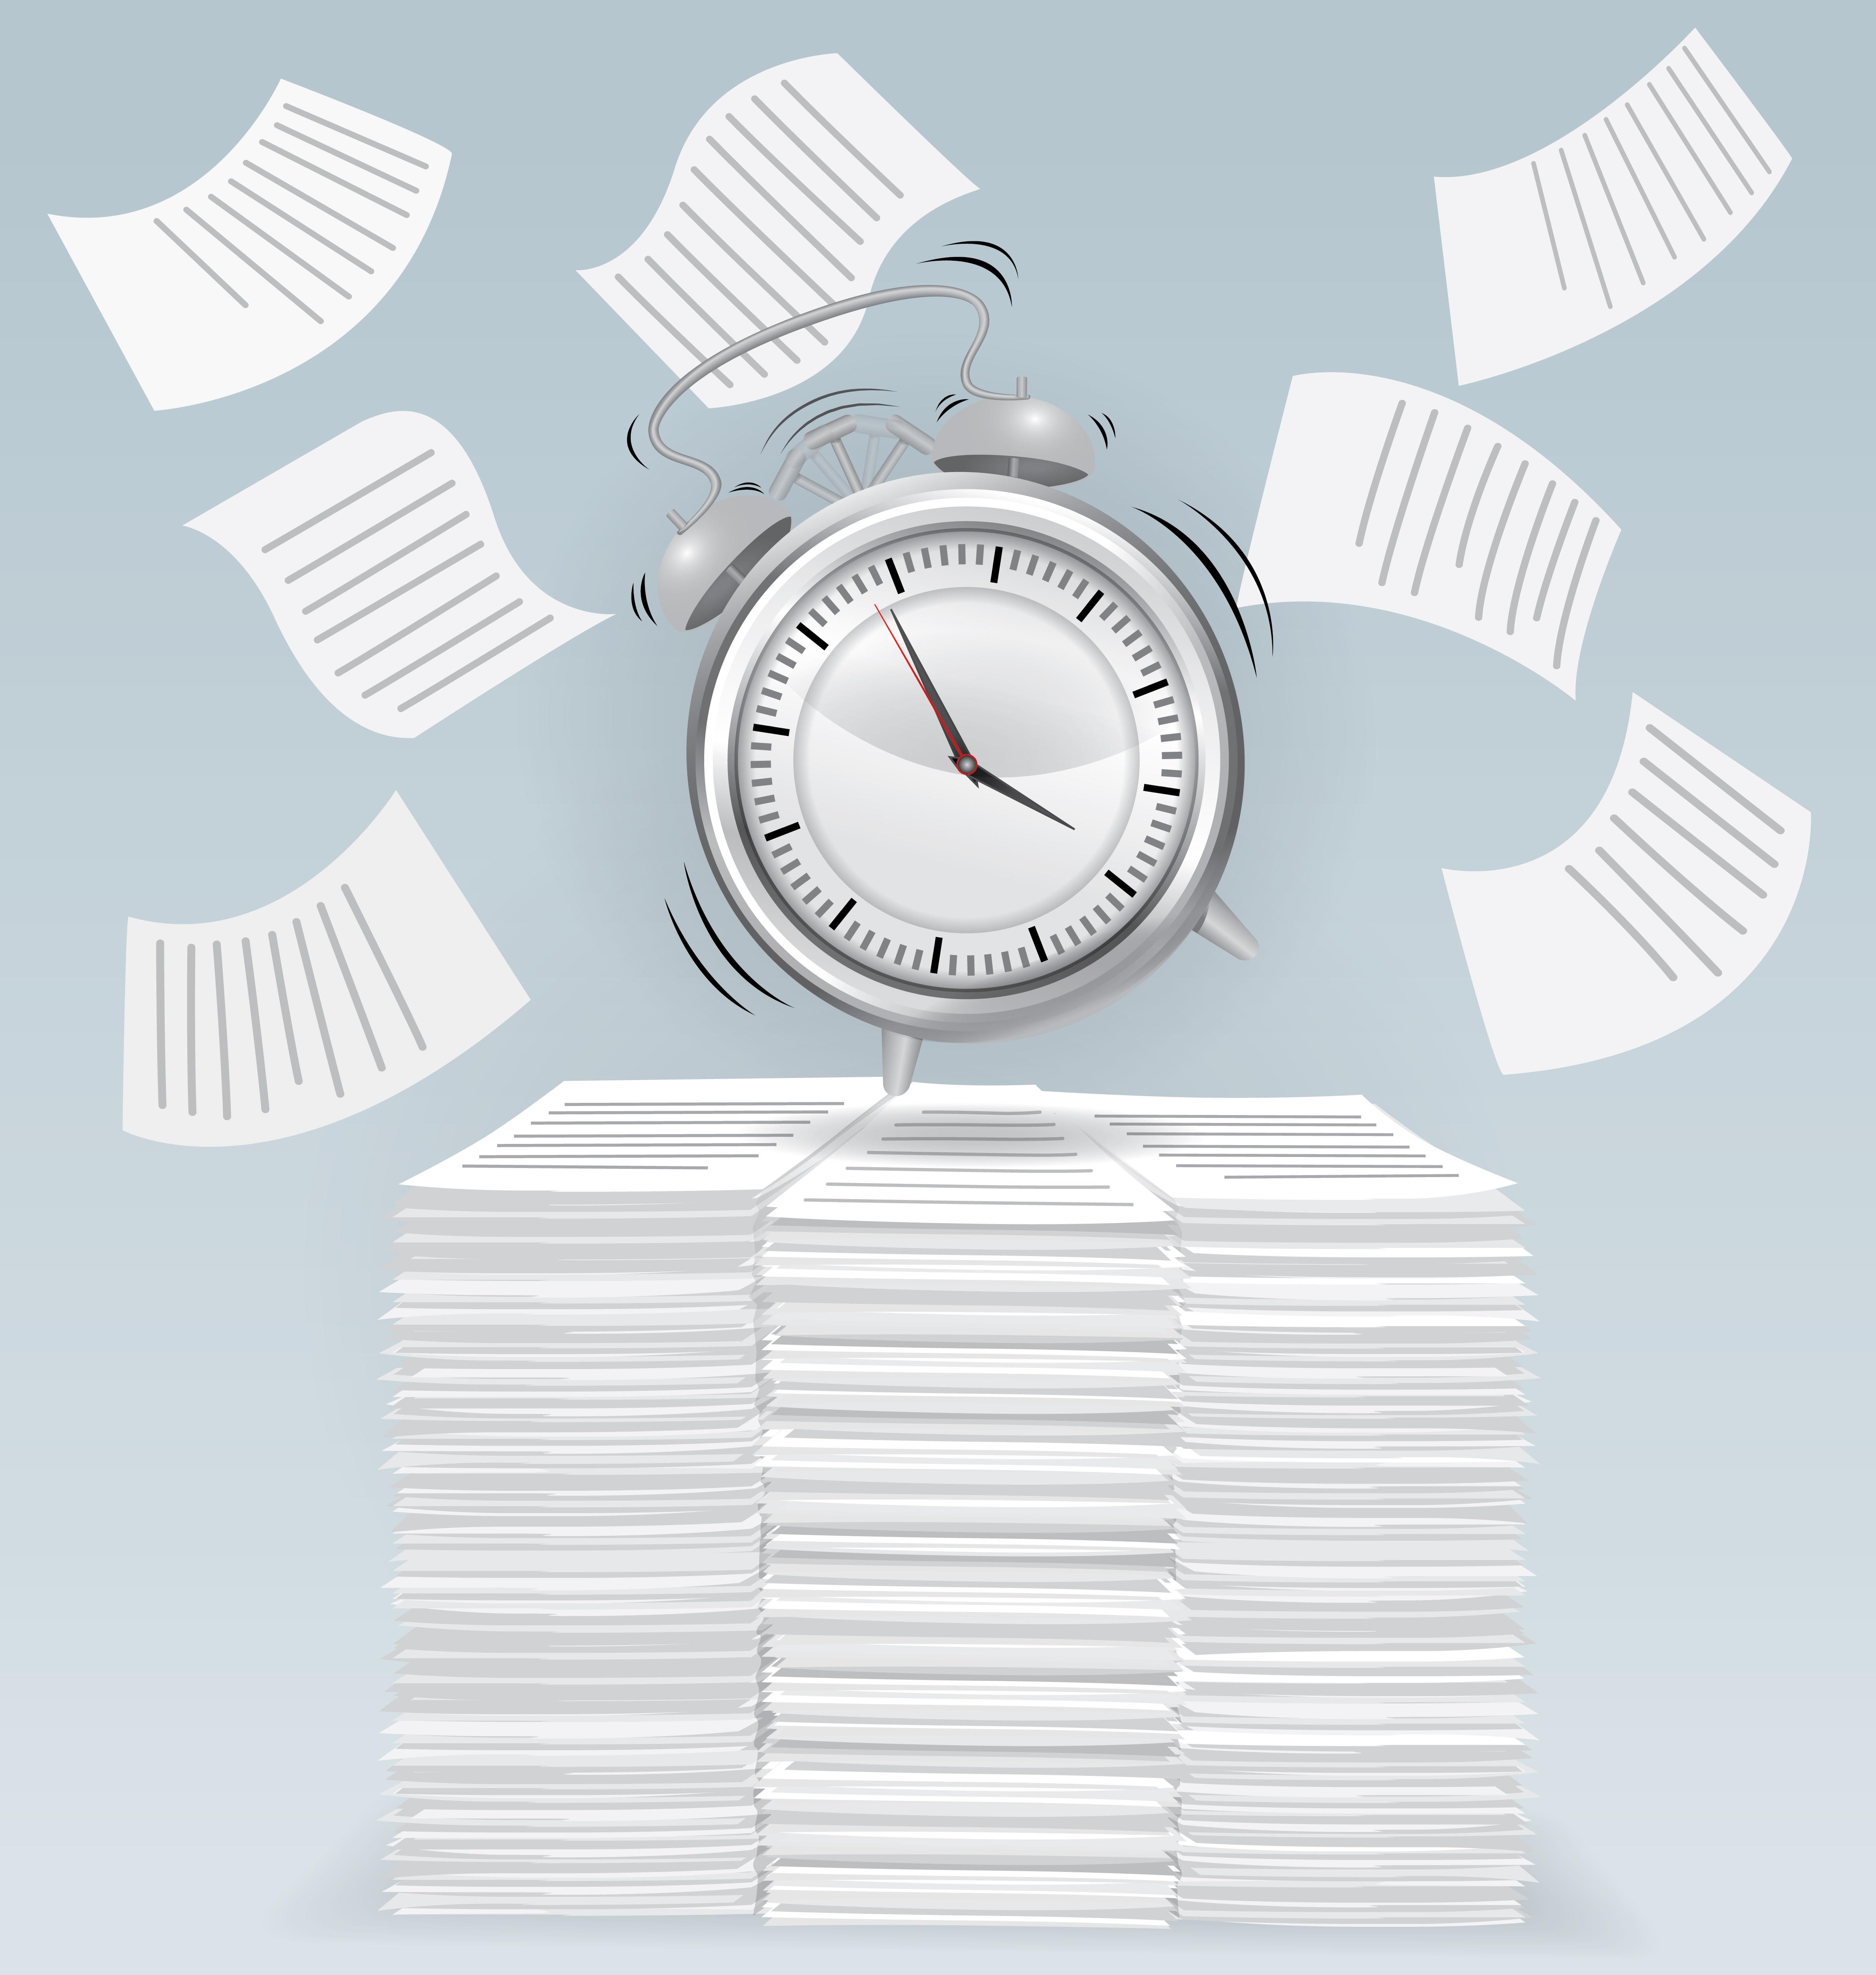 eliminate-paper-enrollment.jpg